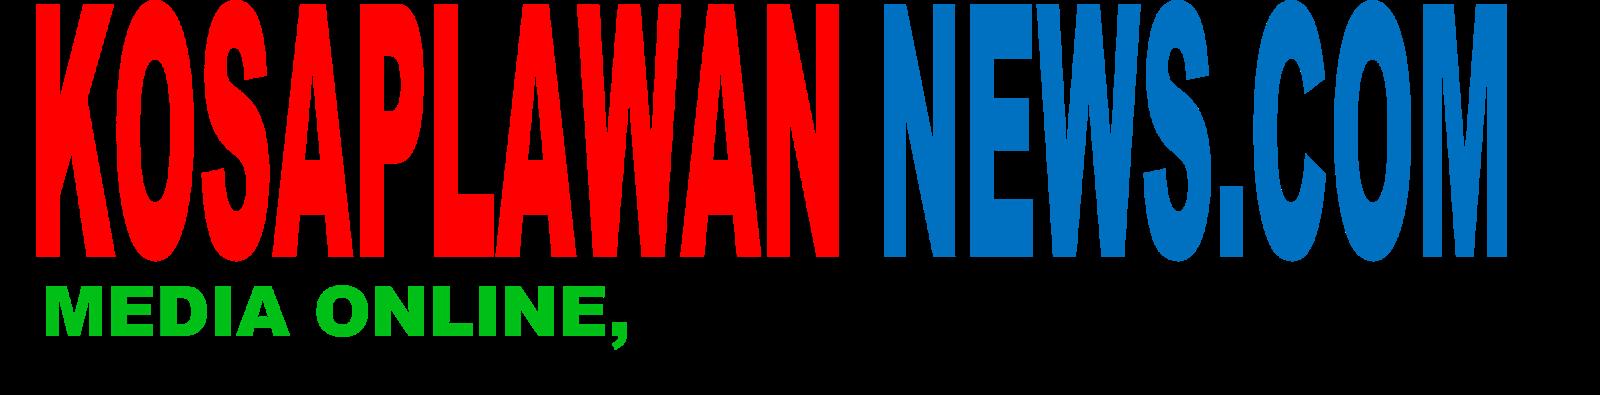 KOSAPLAWAN NEWS.COM